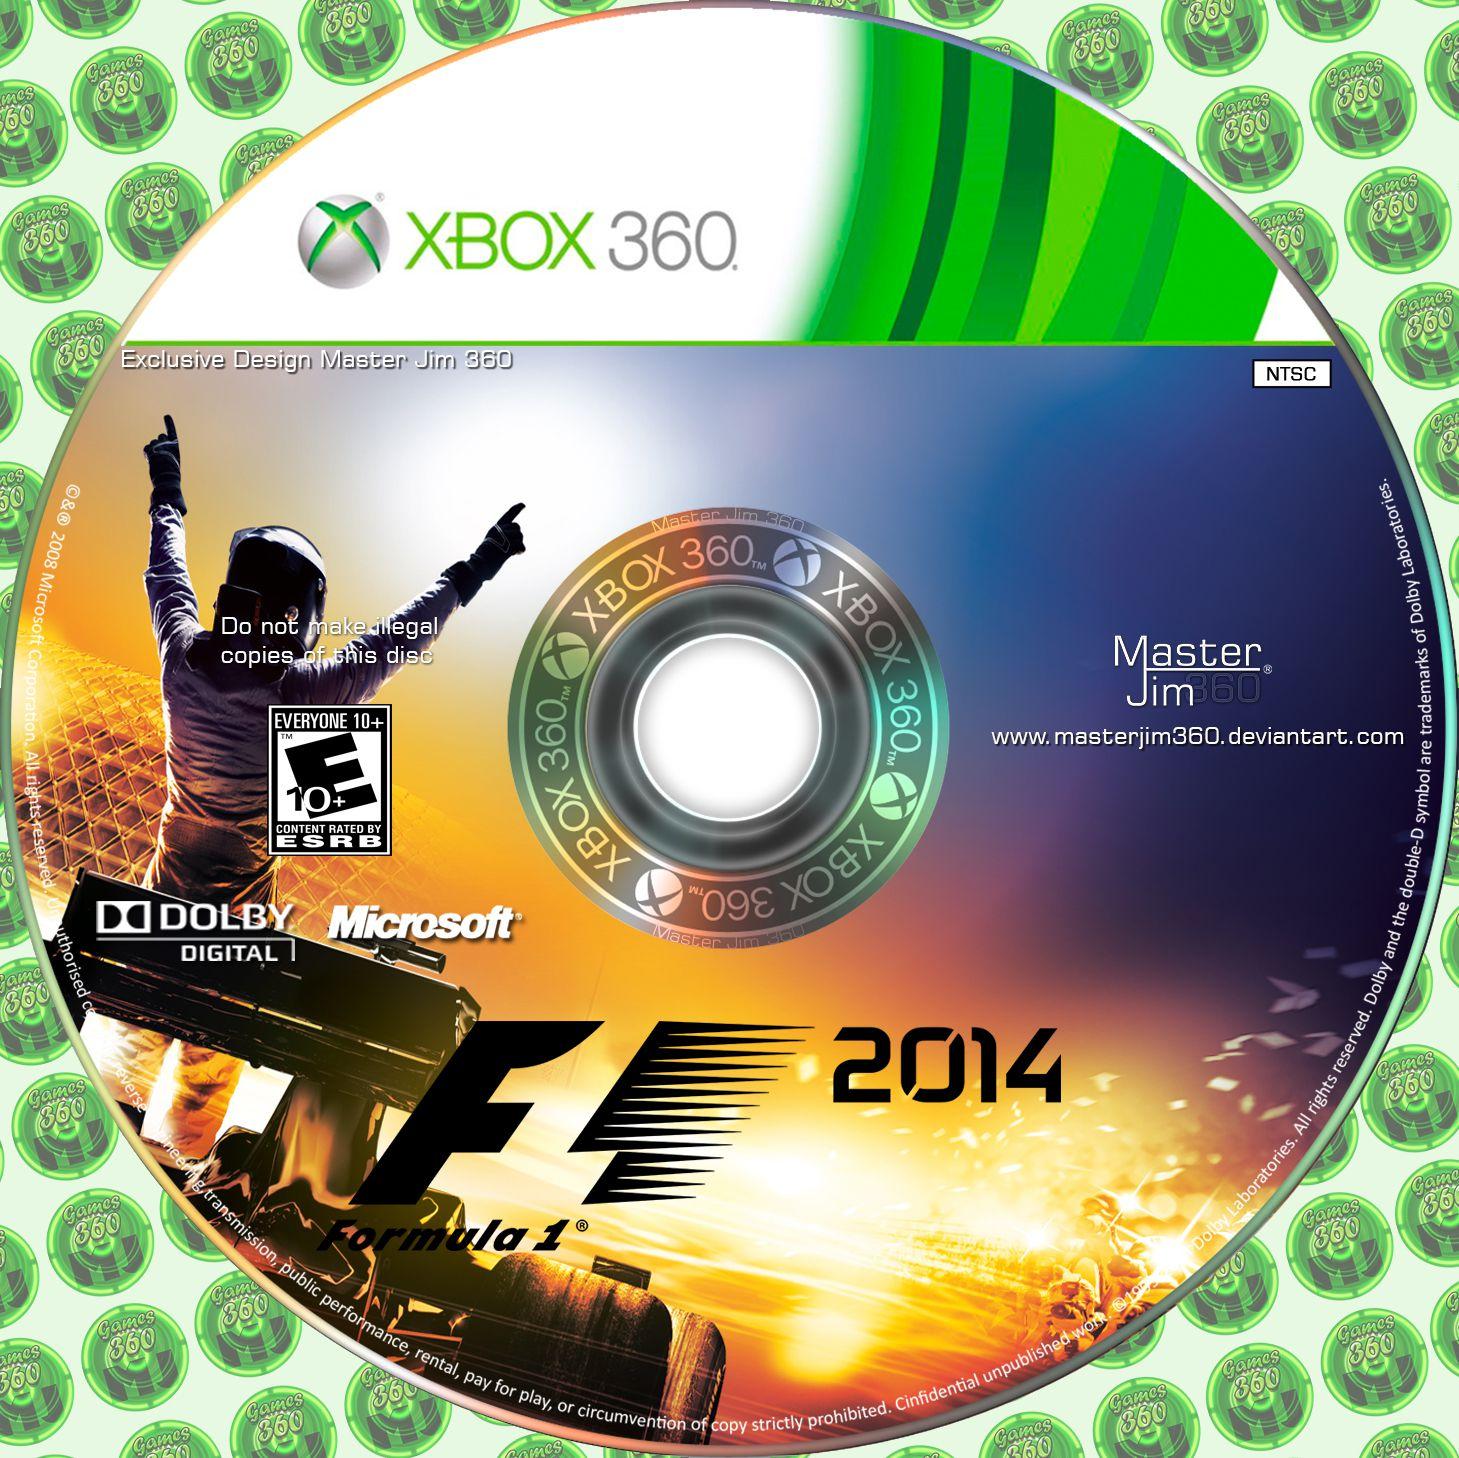 Label Formula 1 2014 Xbox 360